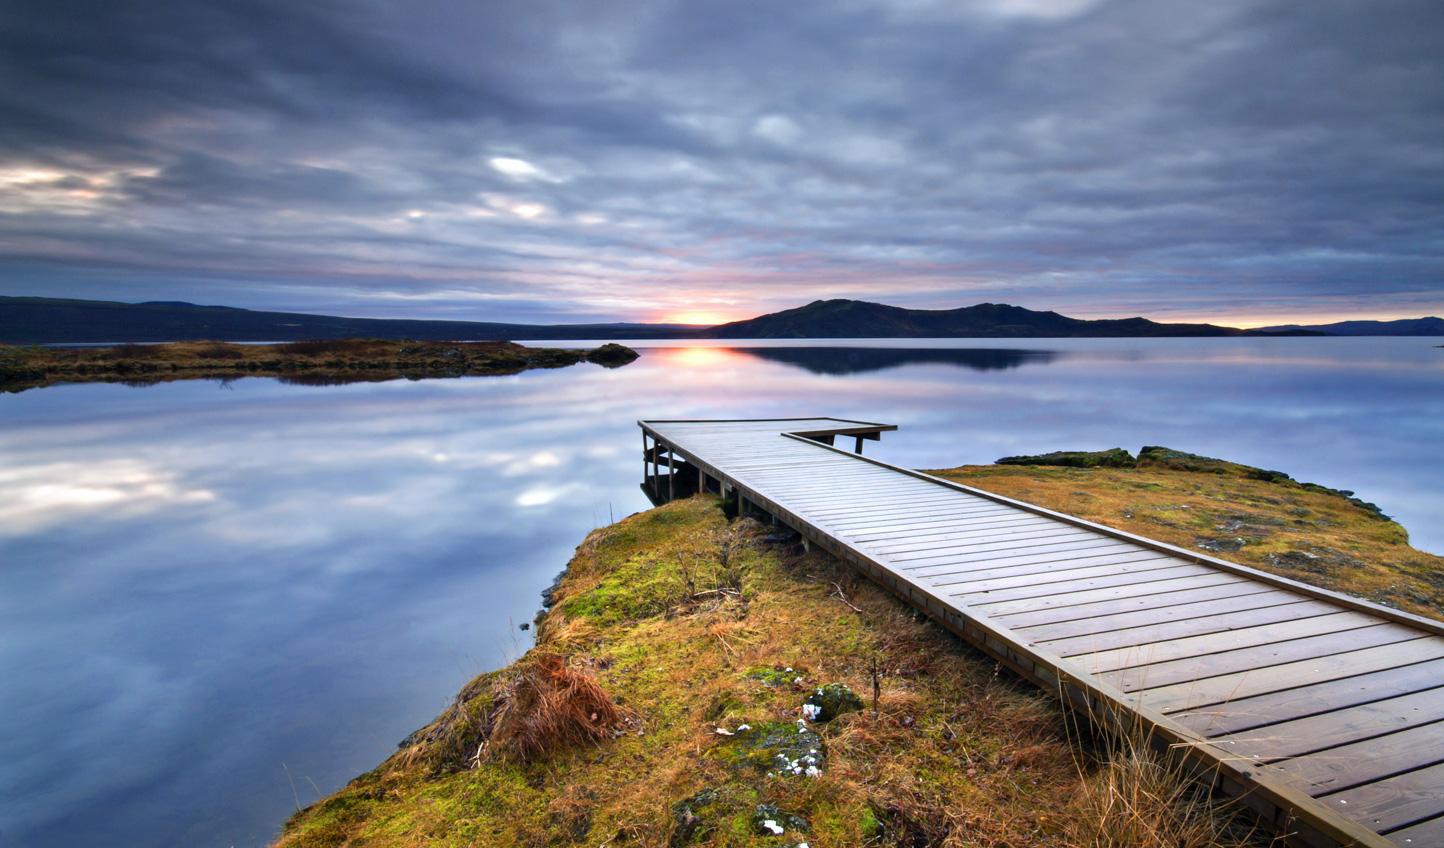 Soak in the beauty of Thingvellir National Park